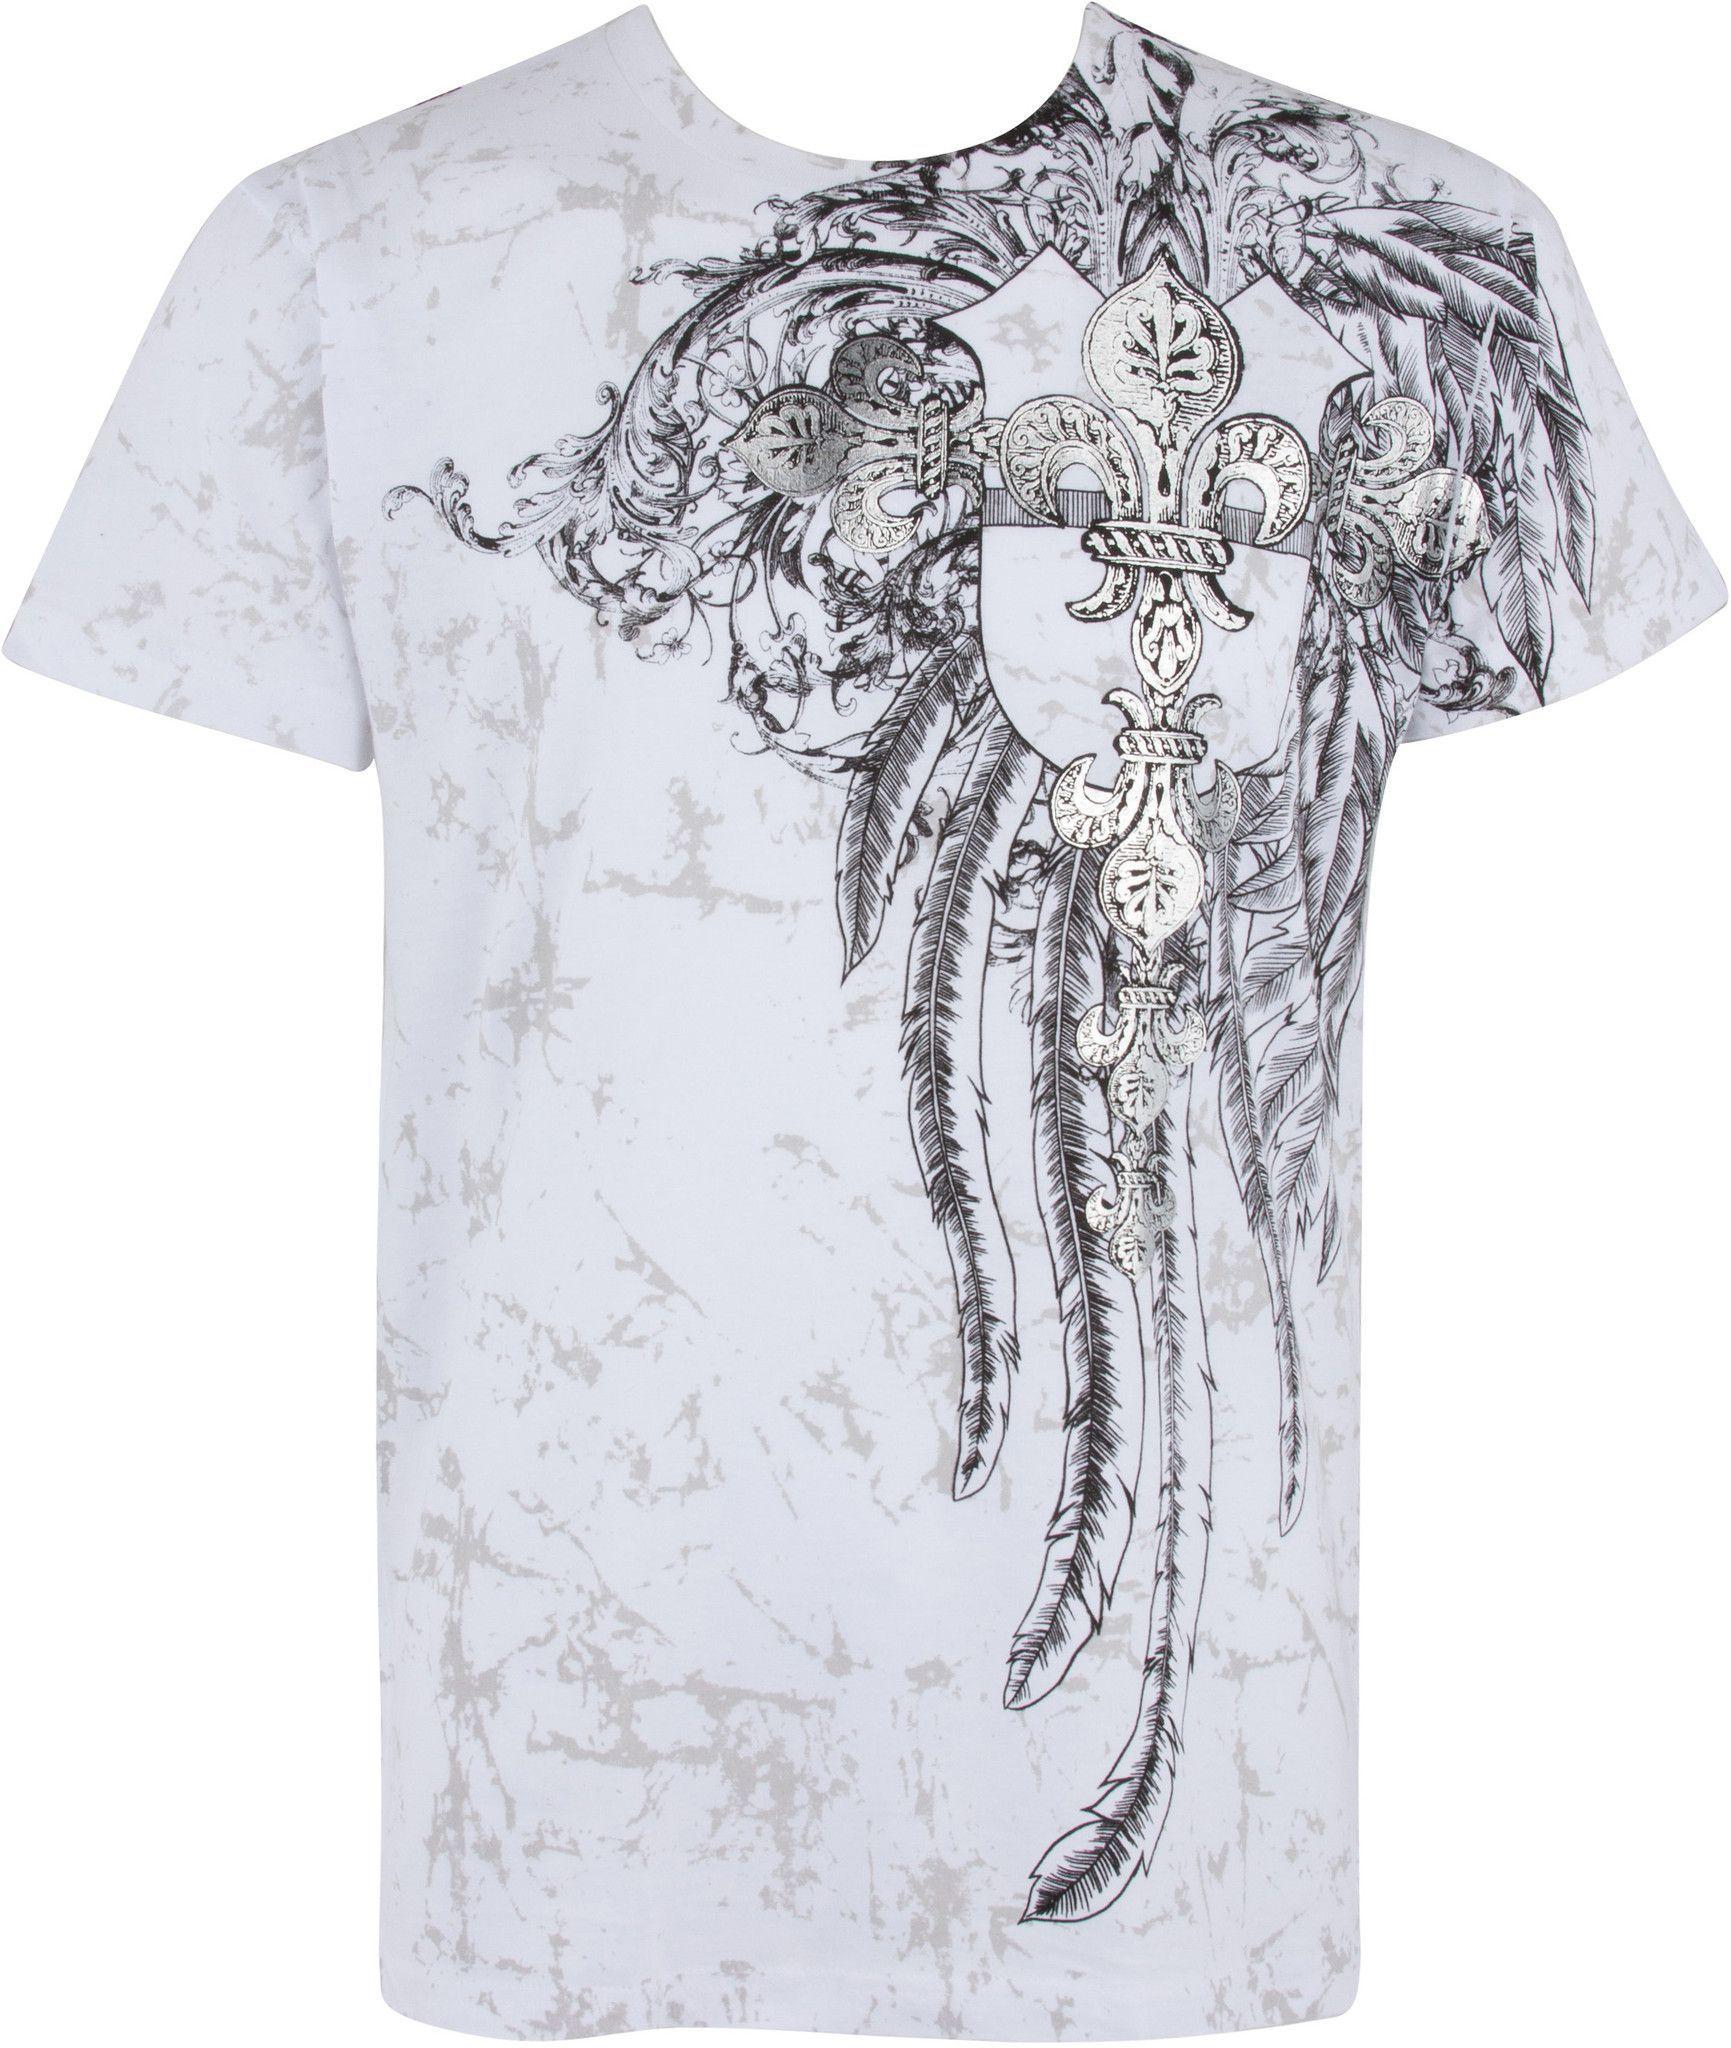 Sakkas Vines and Fleur De Lis Metallic Silver Embossed V